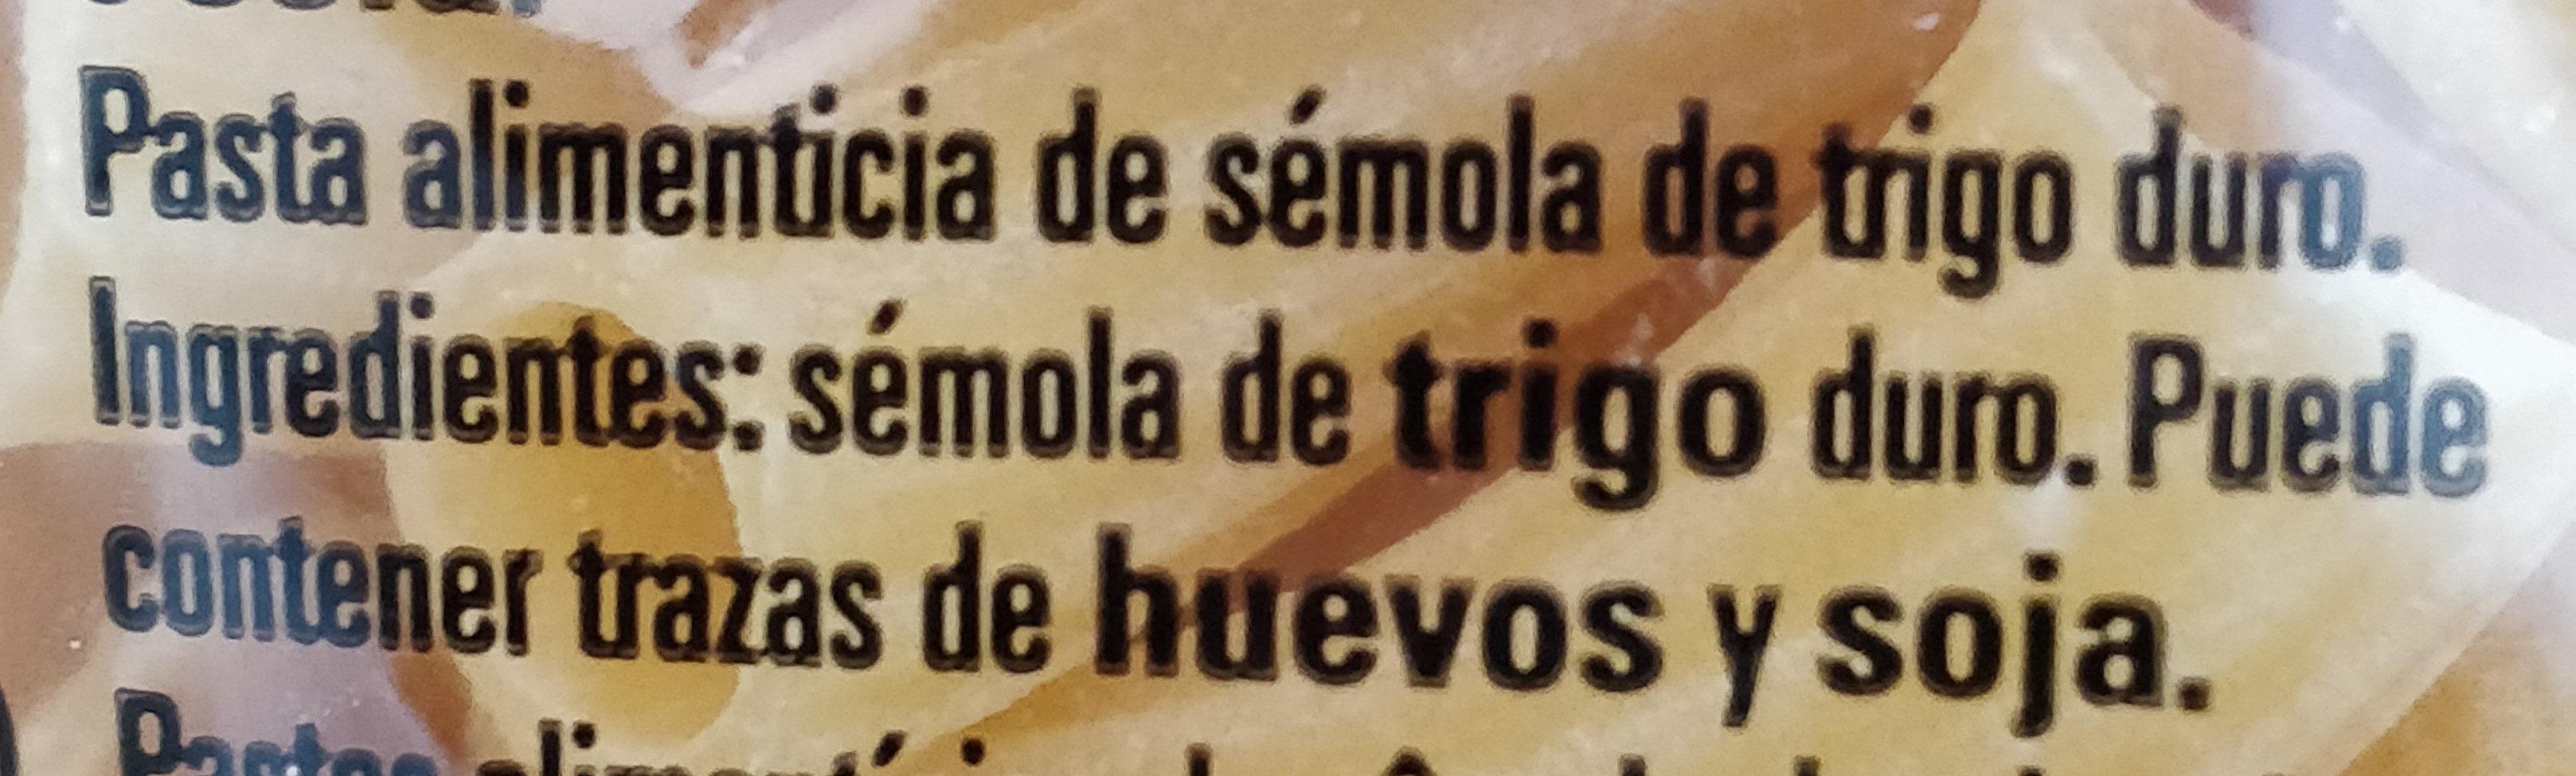 Tortiglioni - Ingrediënten